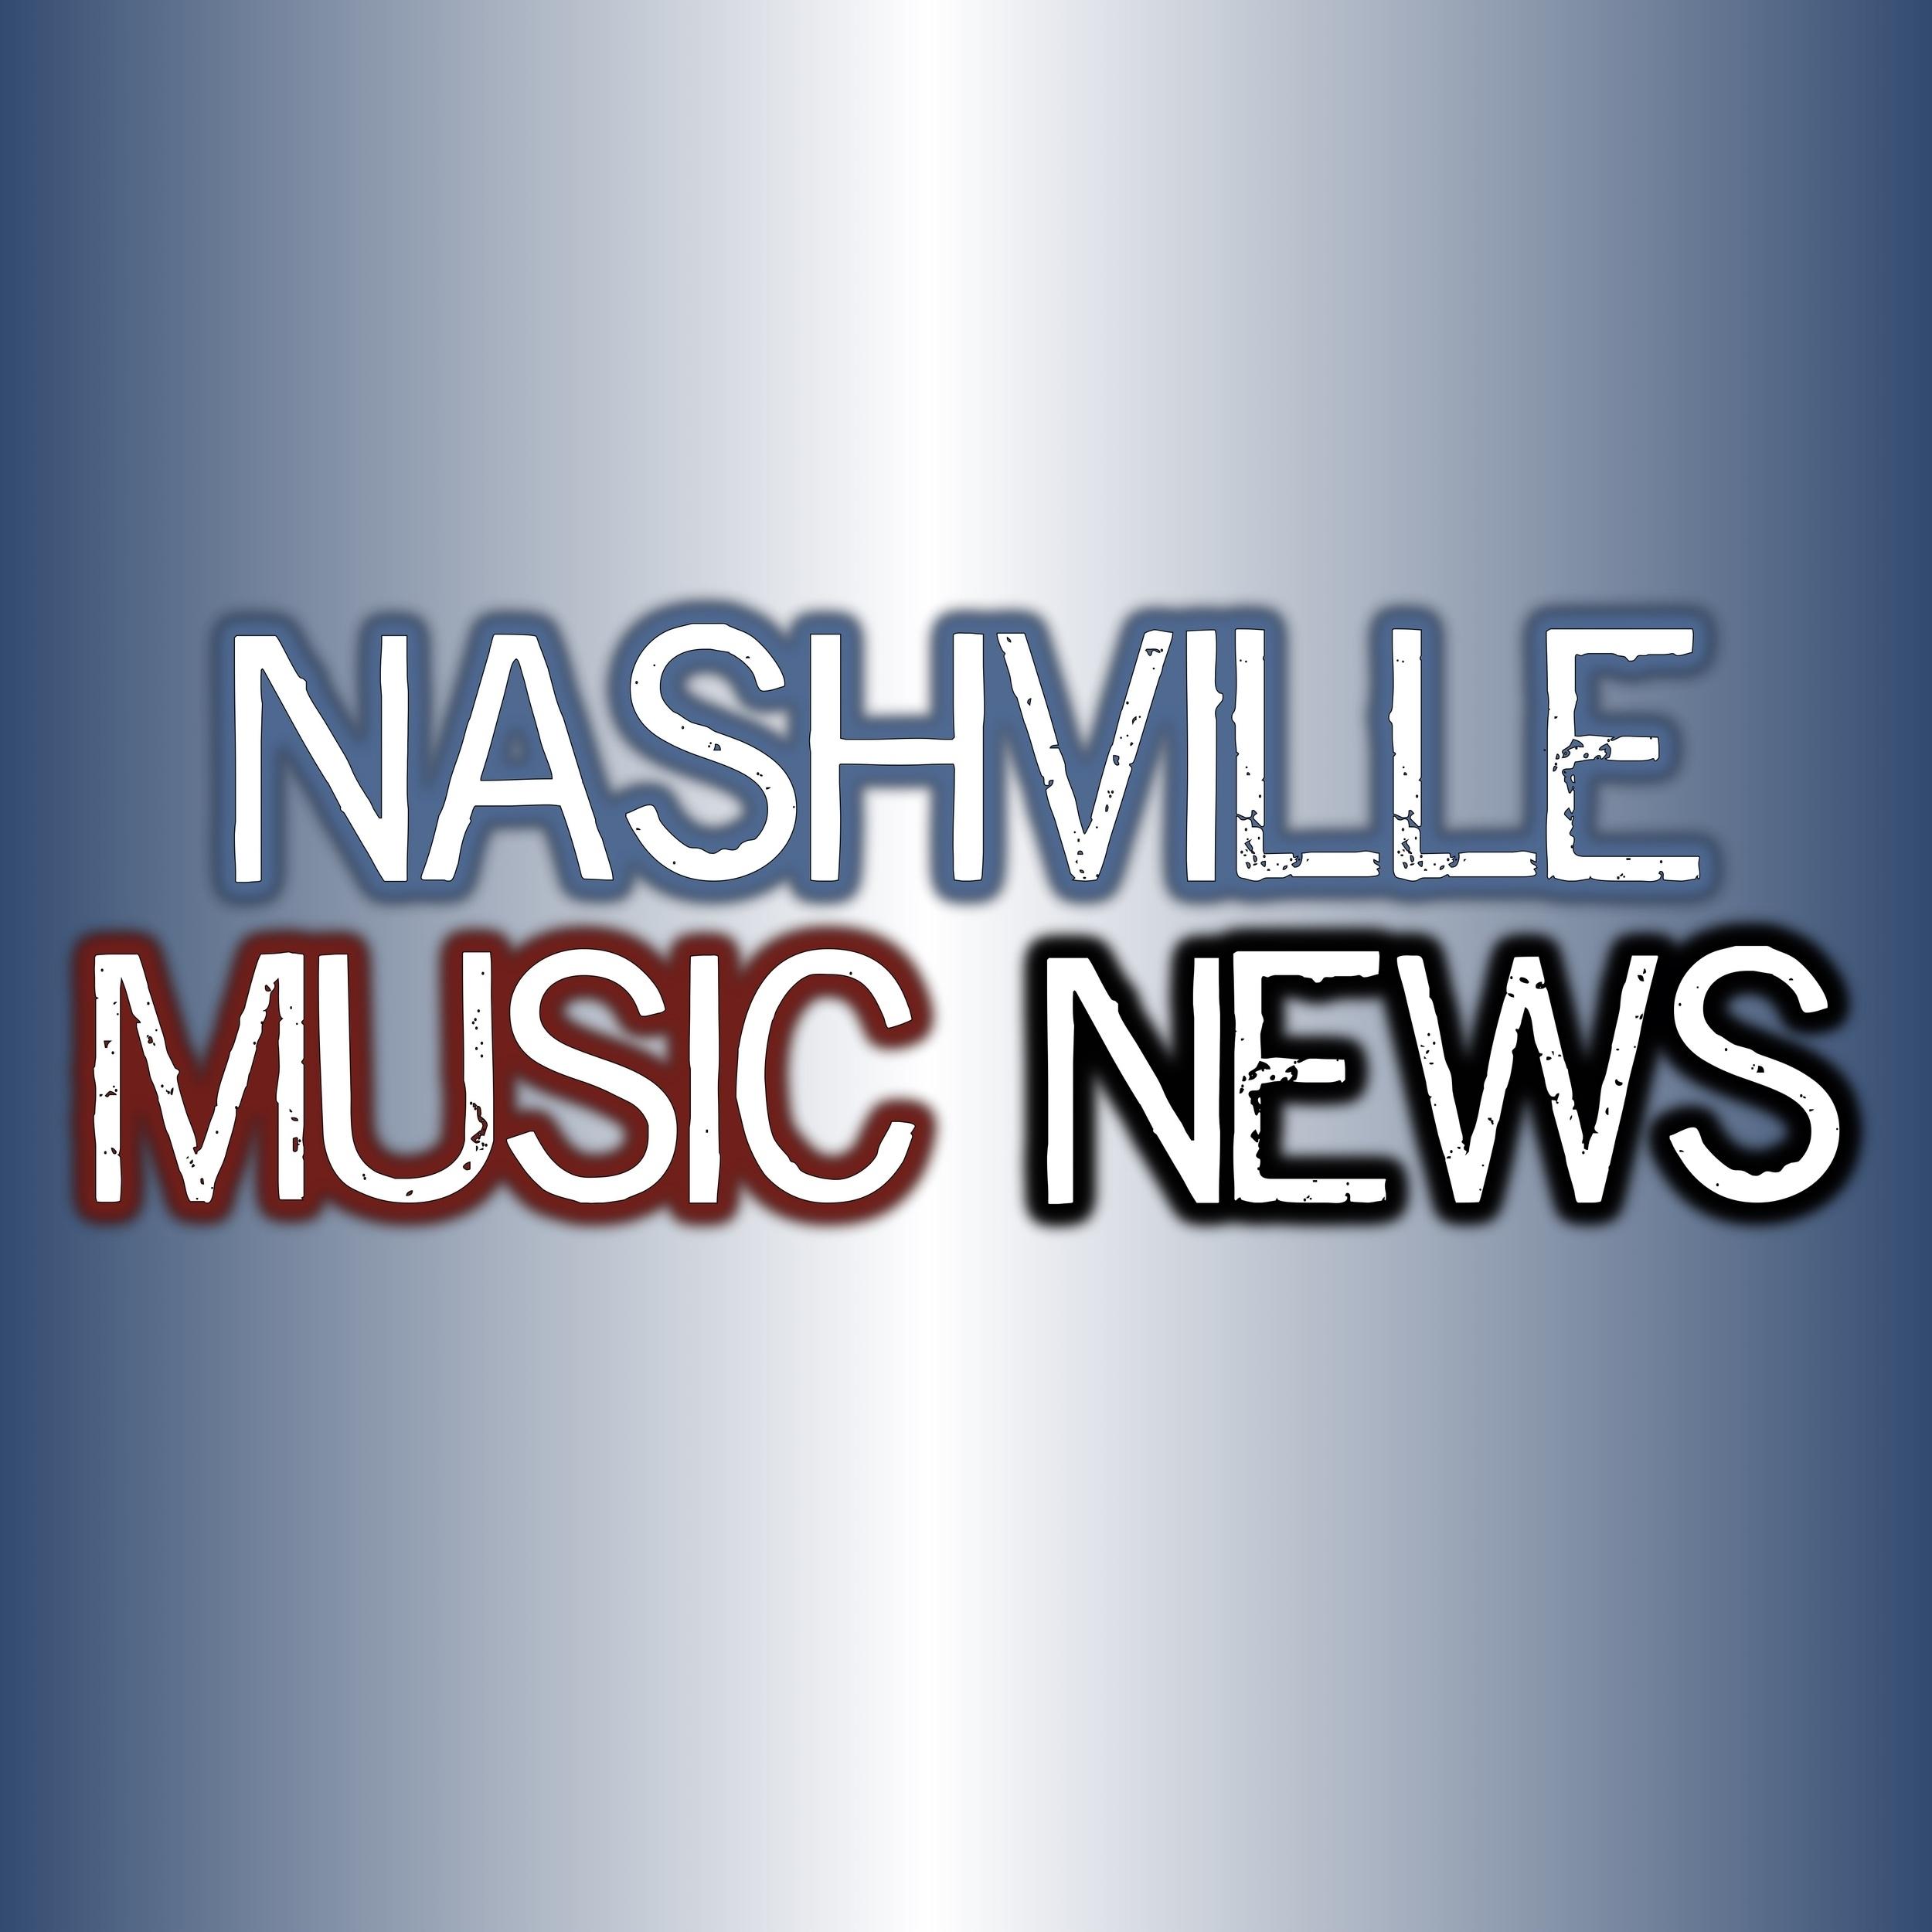 nashvillemusicnews.jpg